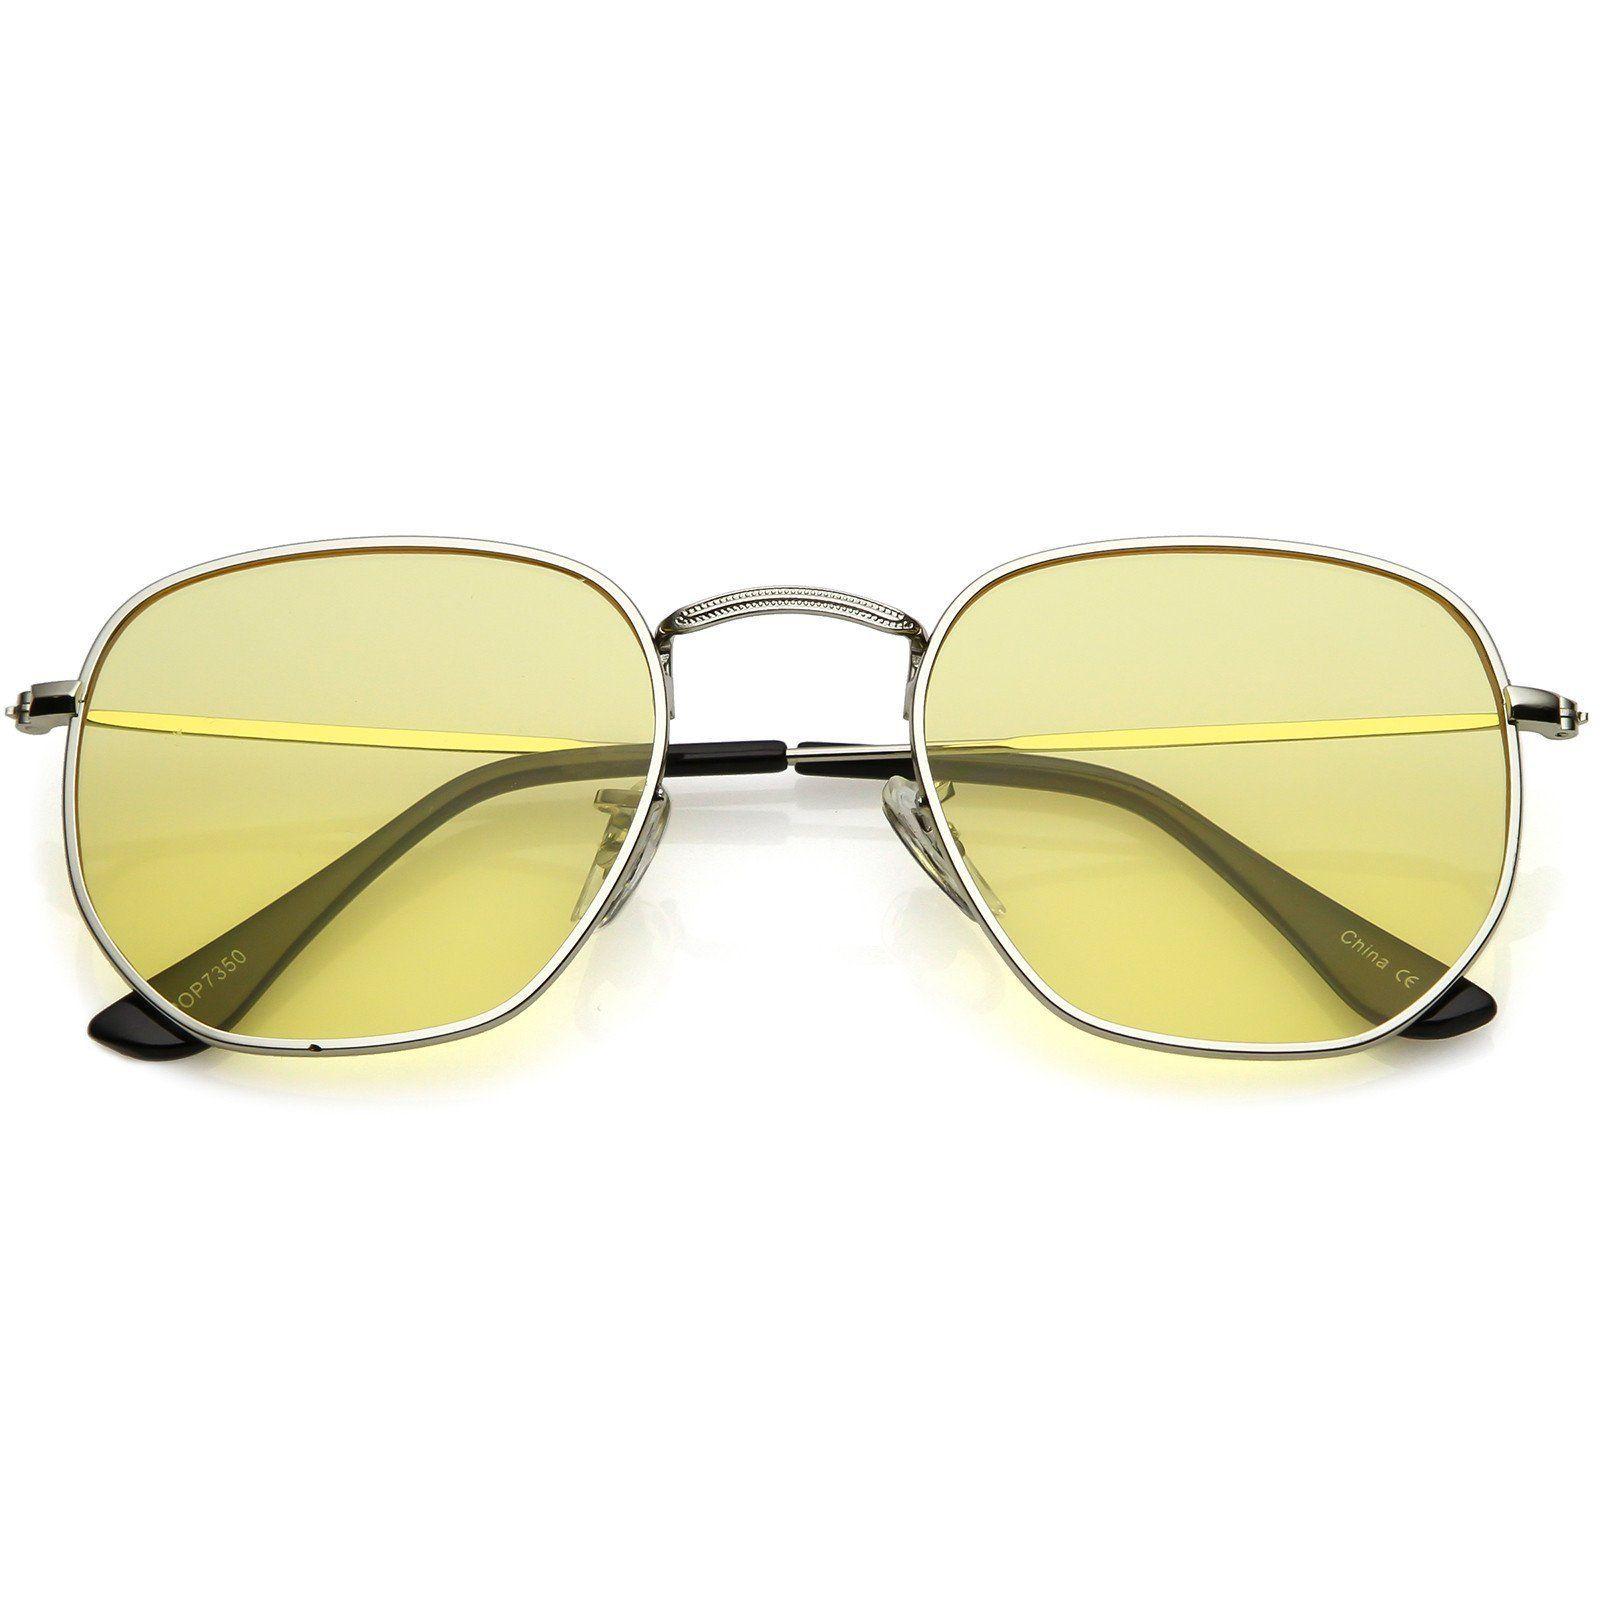 Geometric Large Aviator Sunglasses Mod Metal Frame